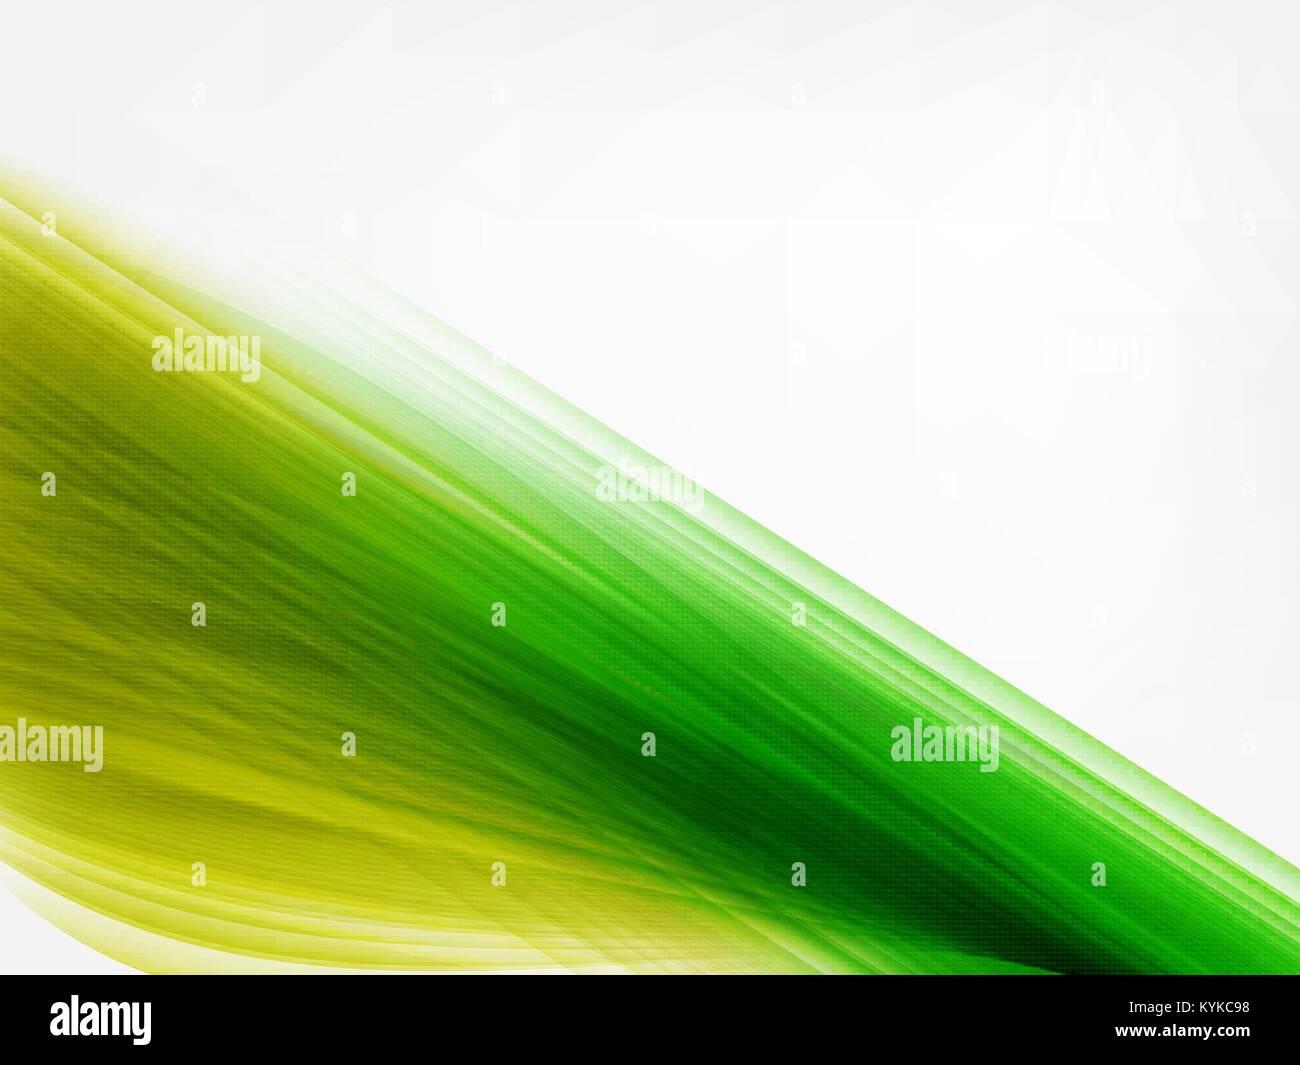 Abstract Strisce Vettore Incandescente Sfondo Verde E Giallo